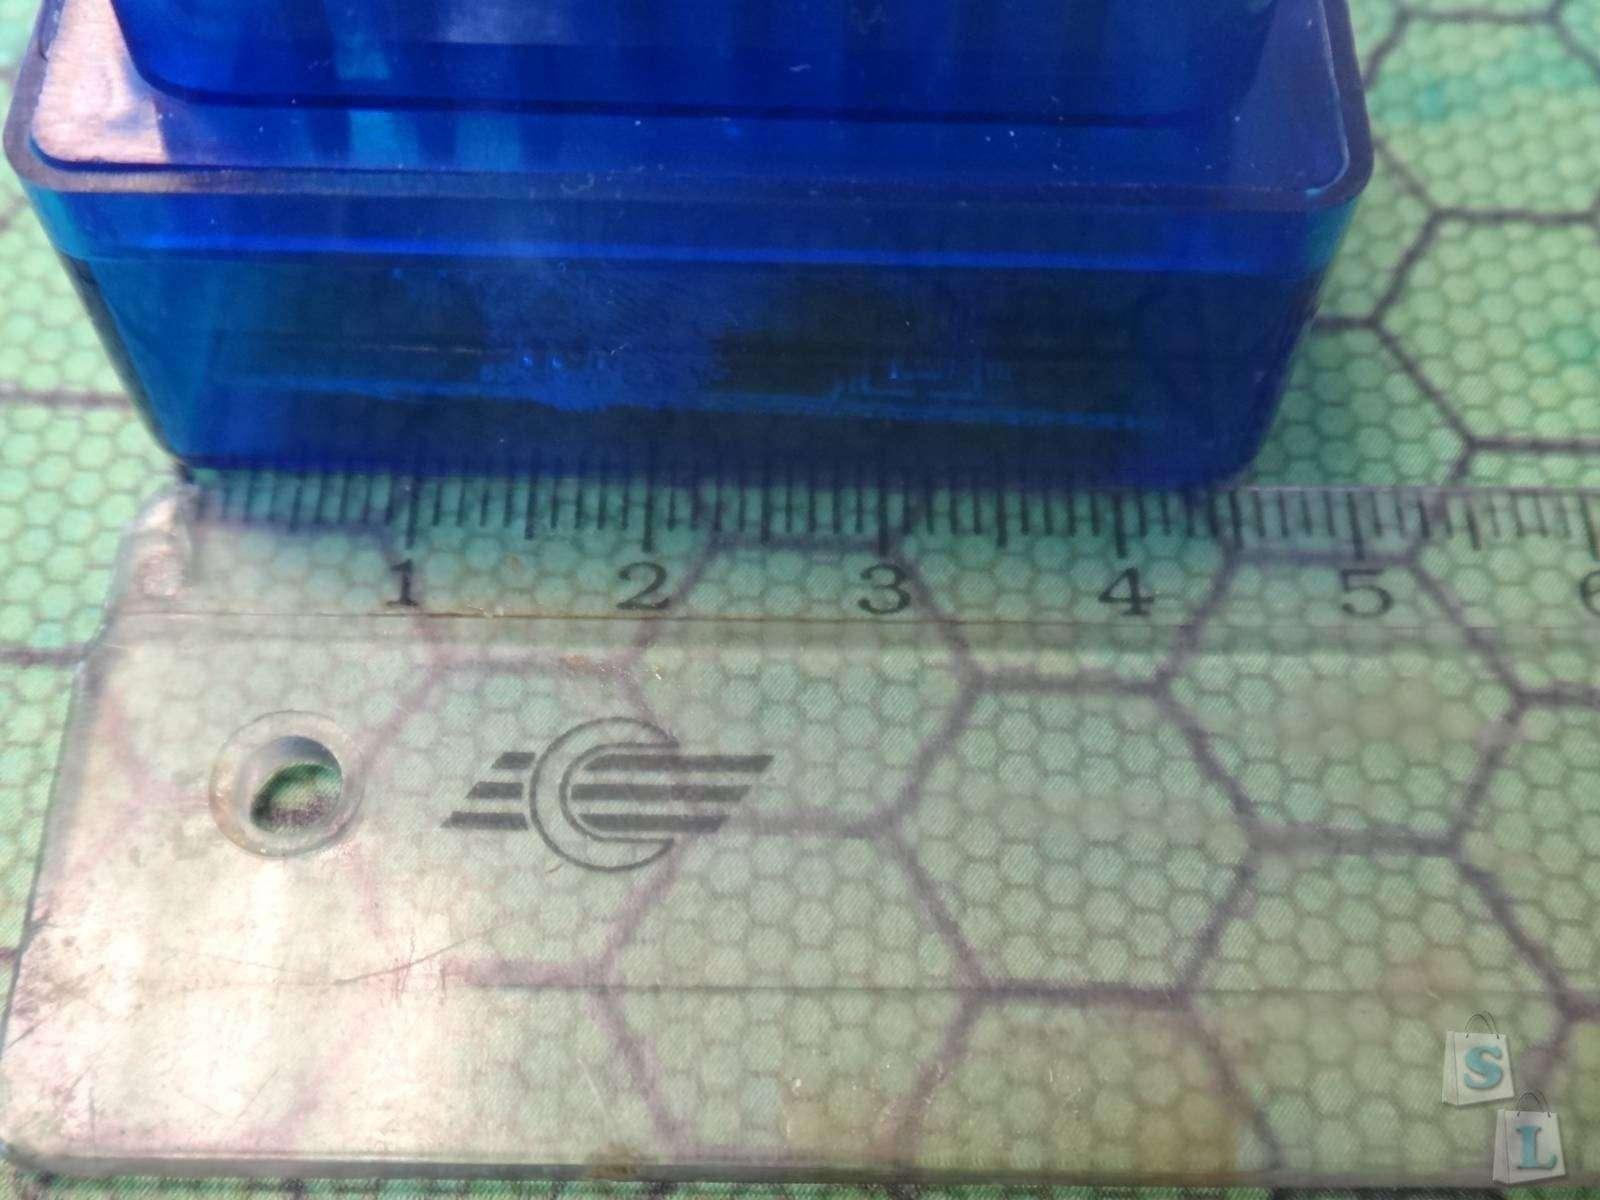 GearBest: Сканер и стираем ошибки ELM327 Bluetooth OBD2 обзор автомобилиста стереть ошибку ДжекиЧан